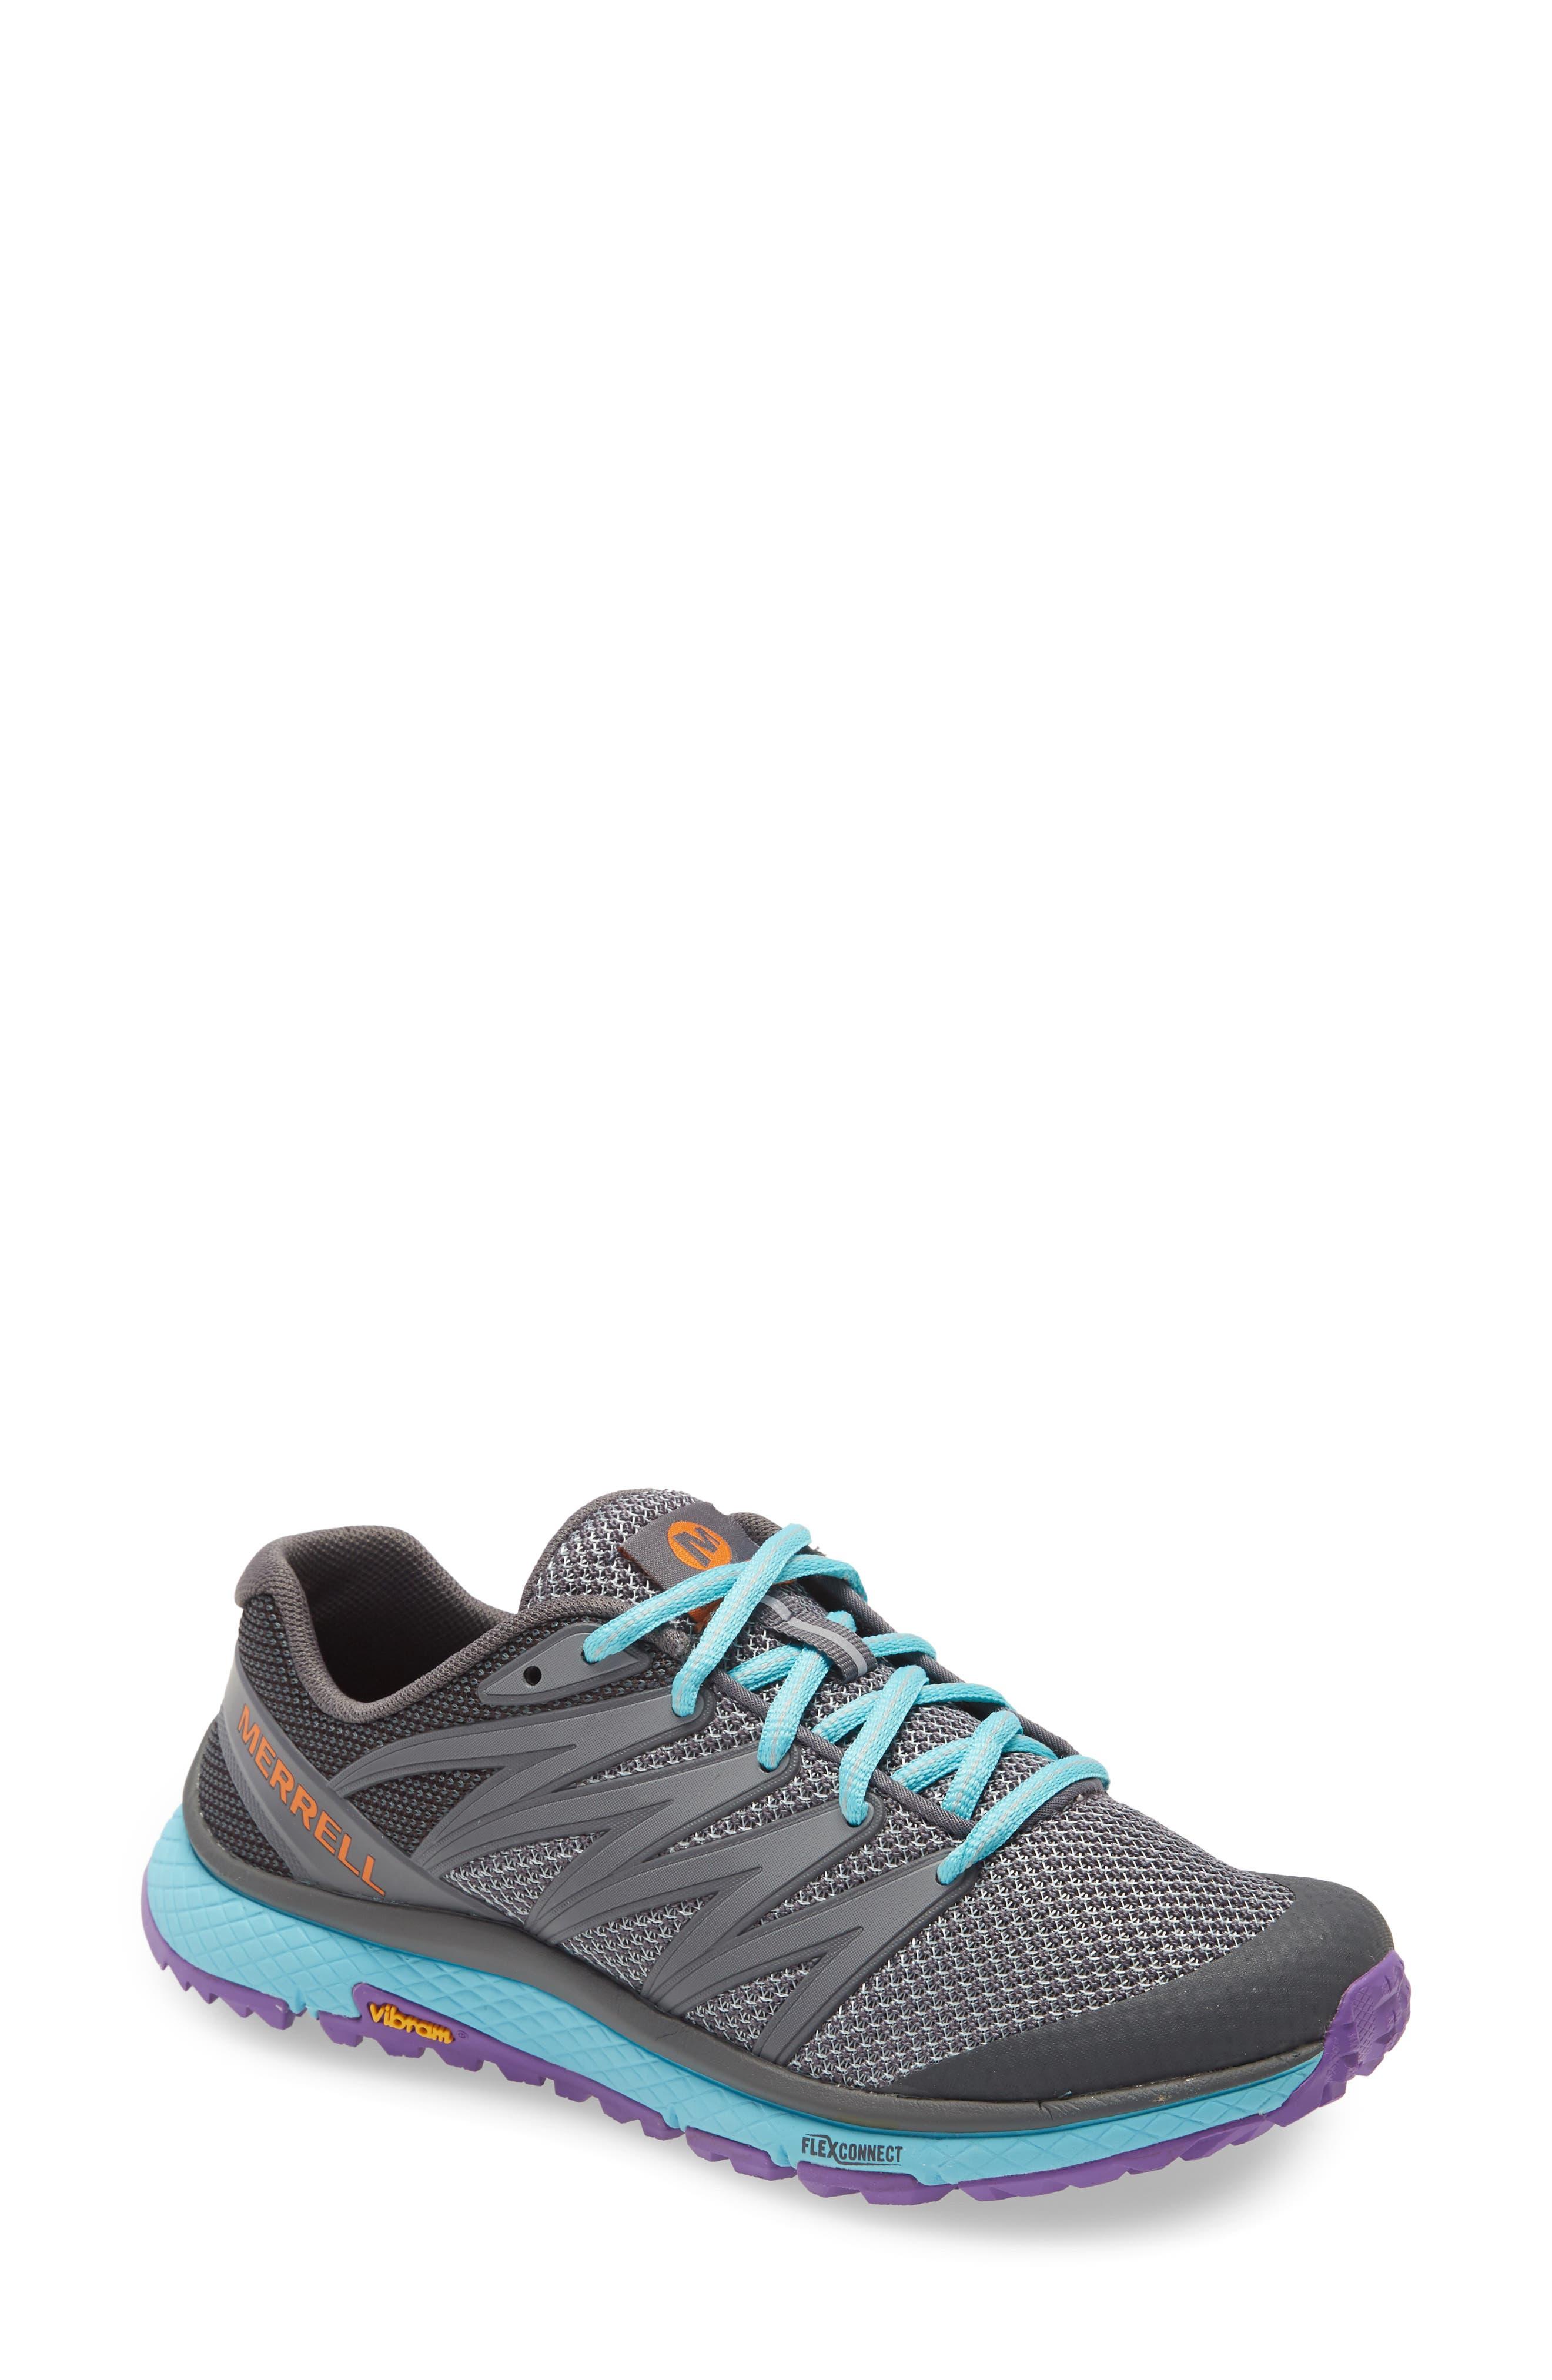 Bare Access Xtr Trail Running Shoe